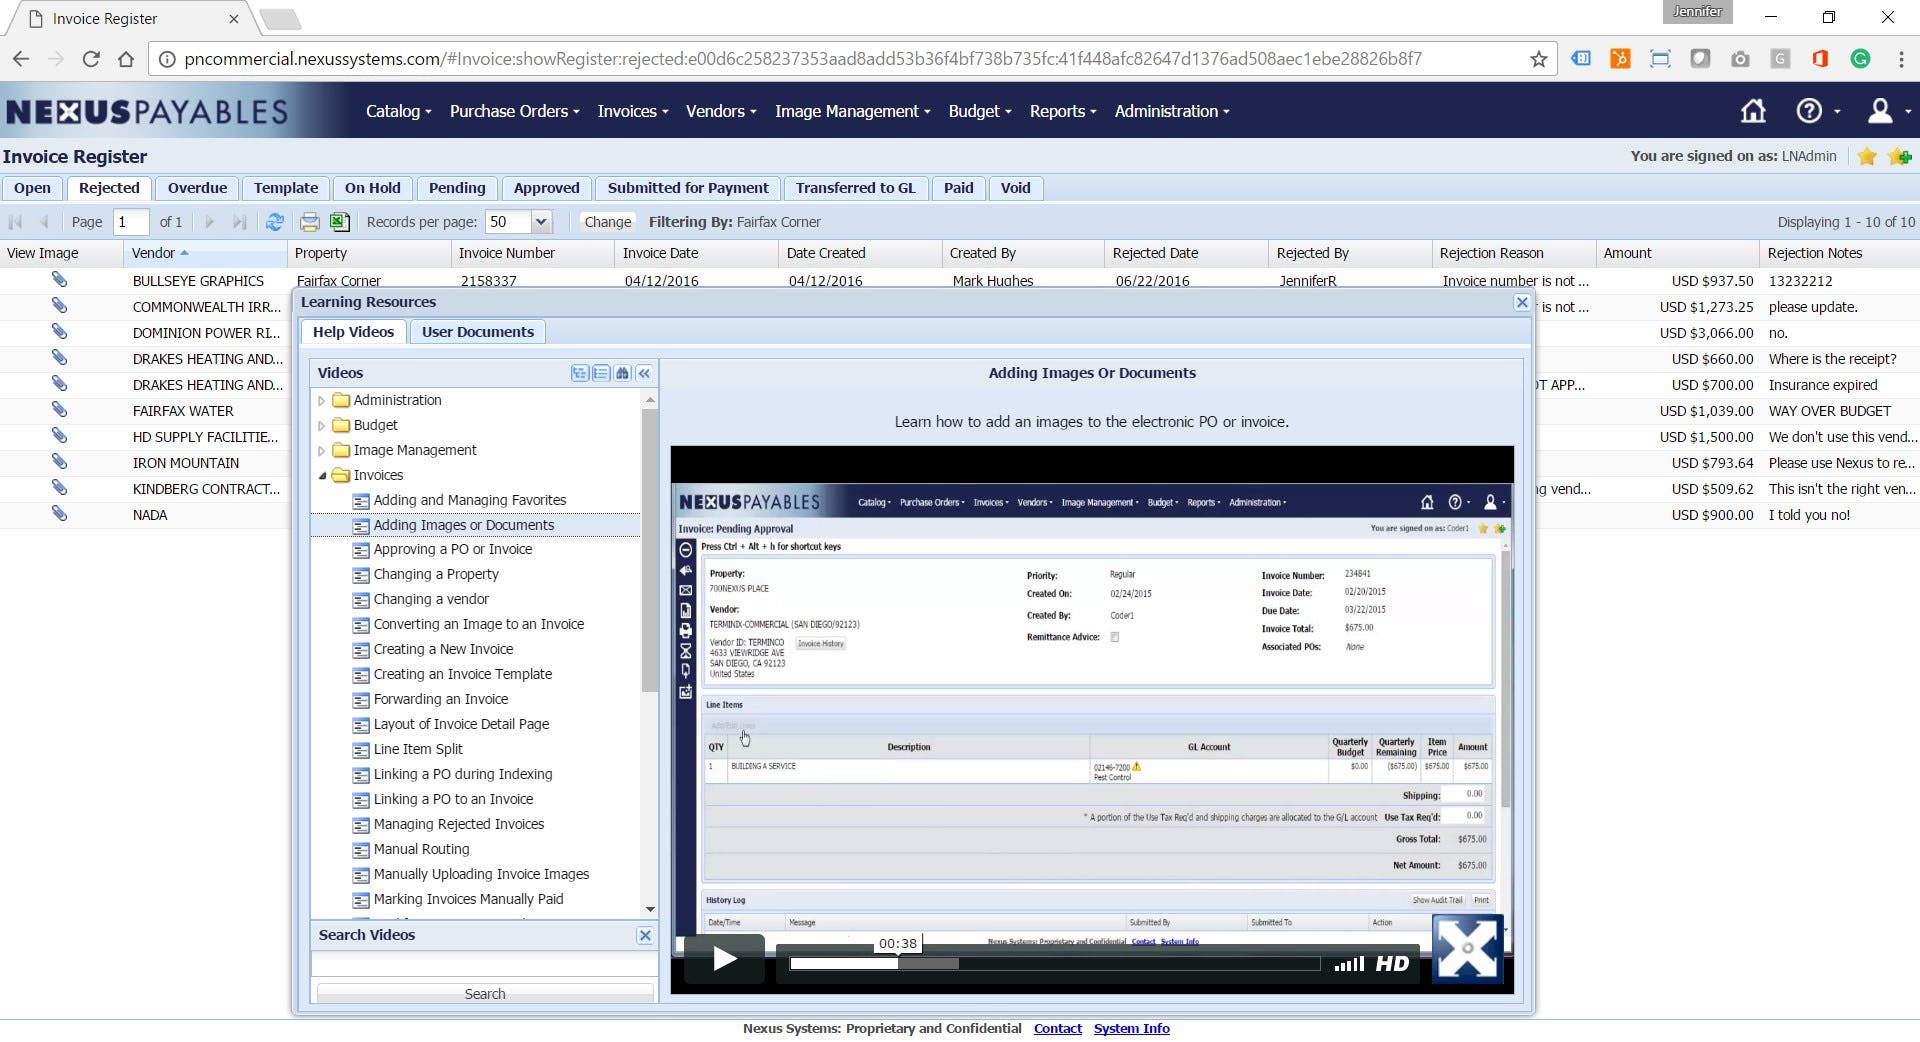 NexusPayables Software - Embedded user training